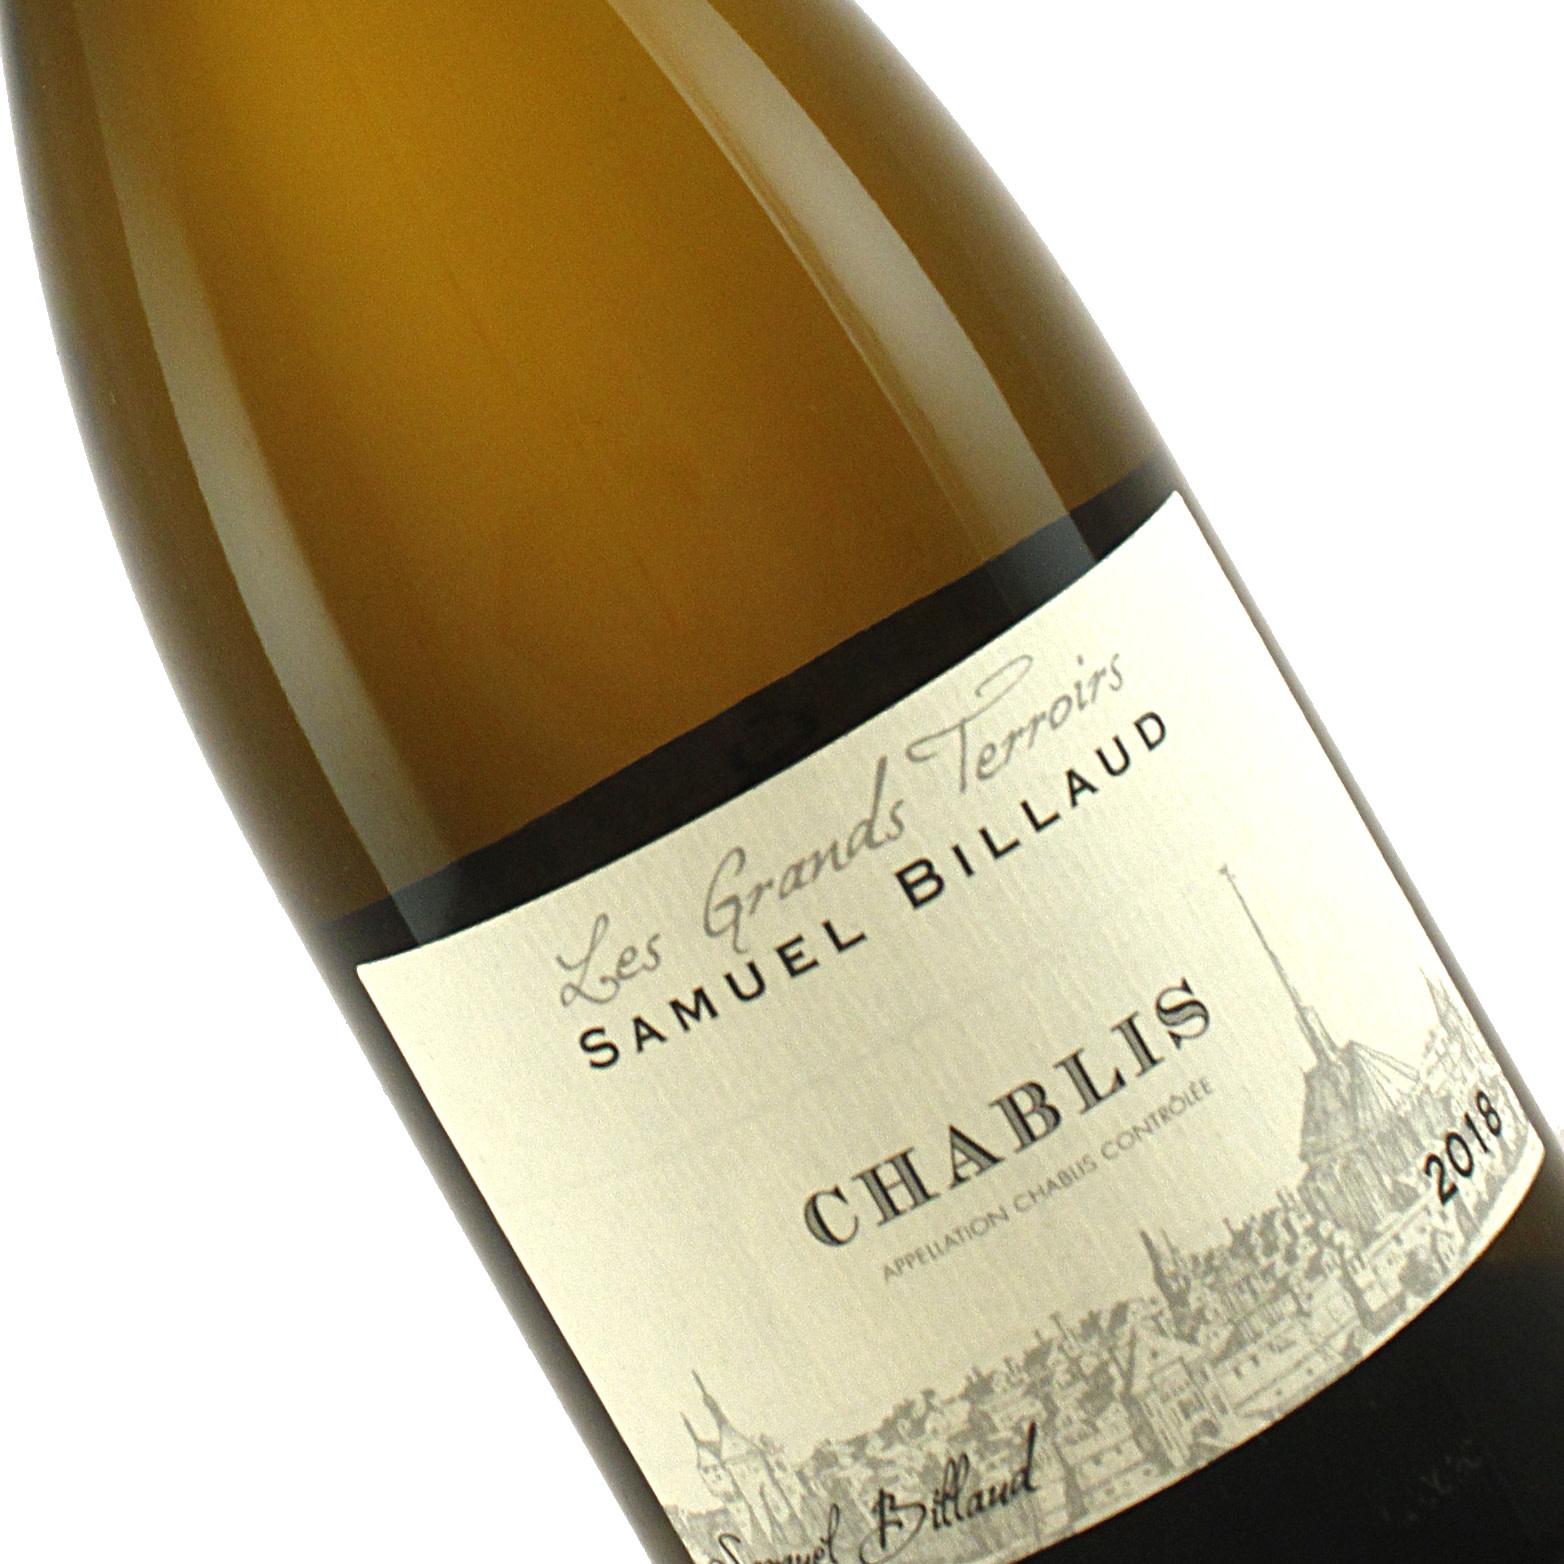 Samuel Billaud 2019 Chablis, Burgundy